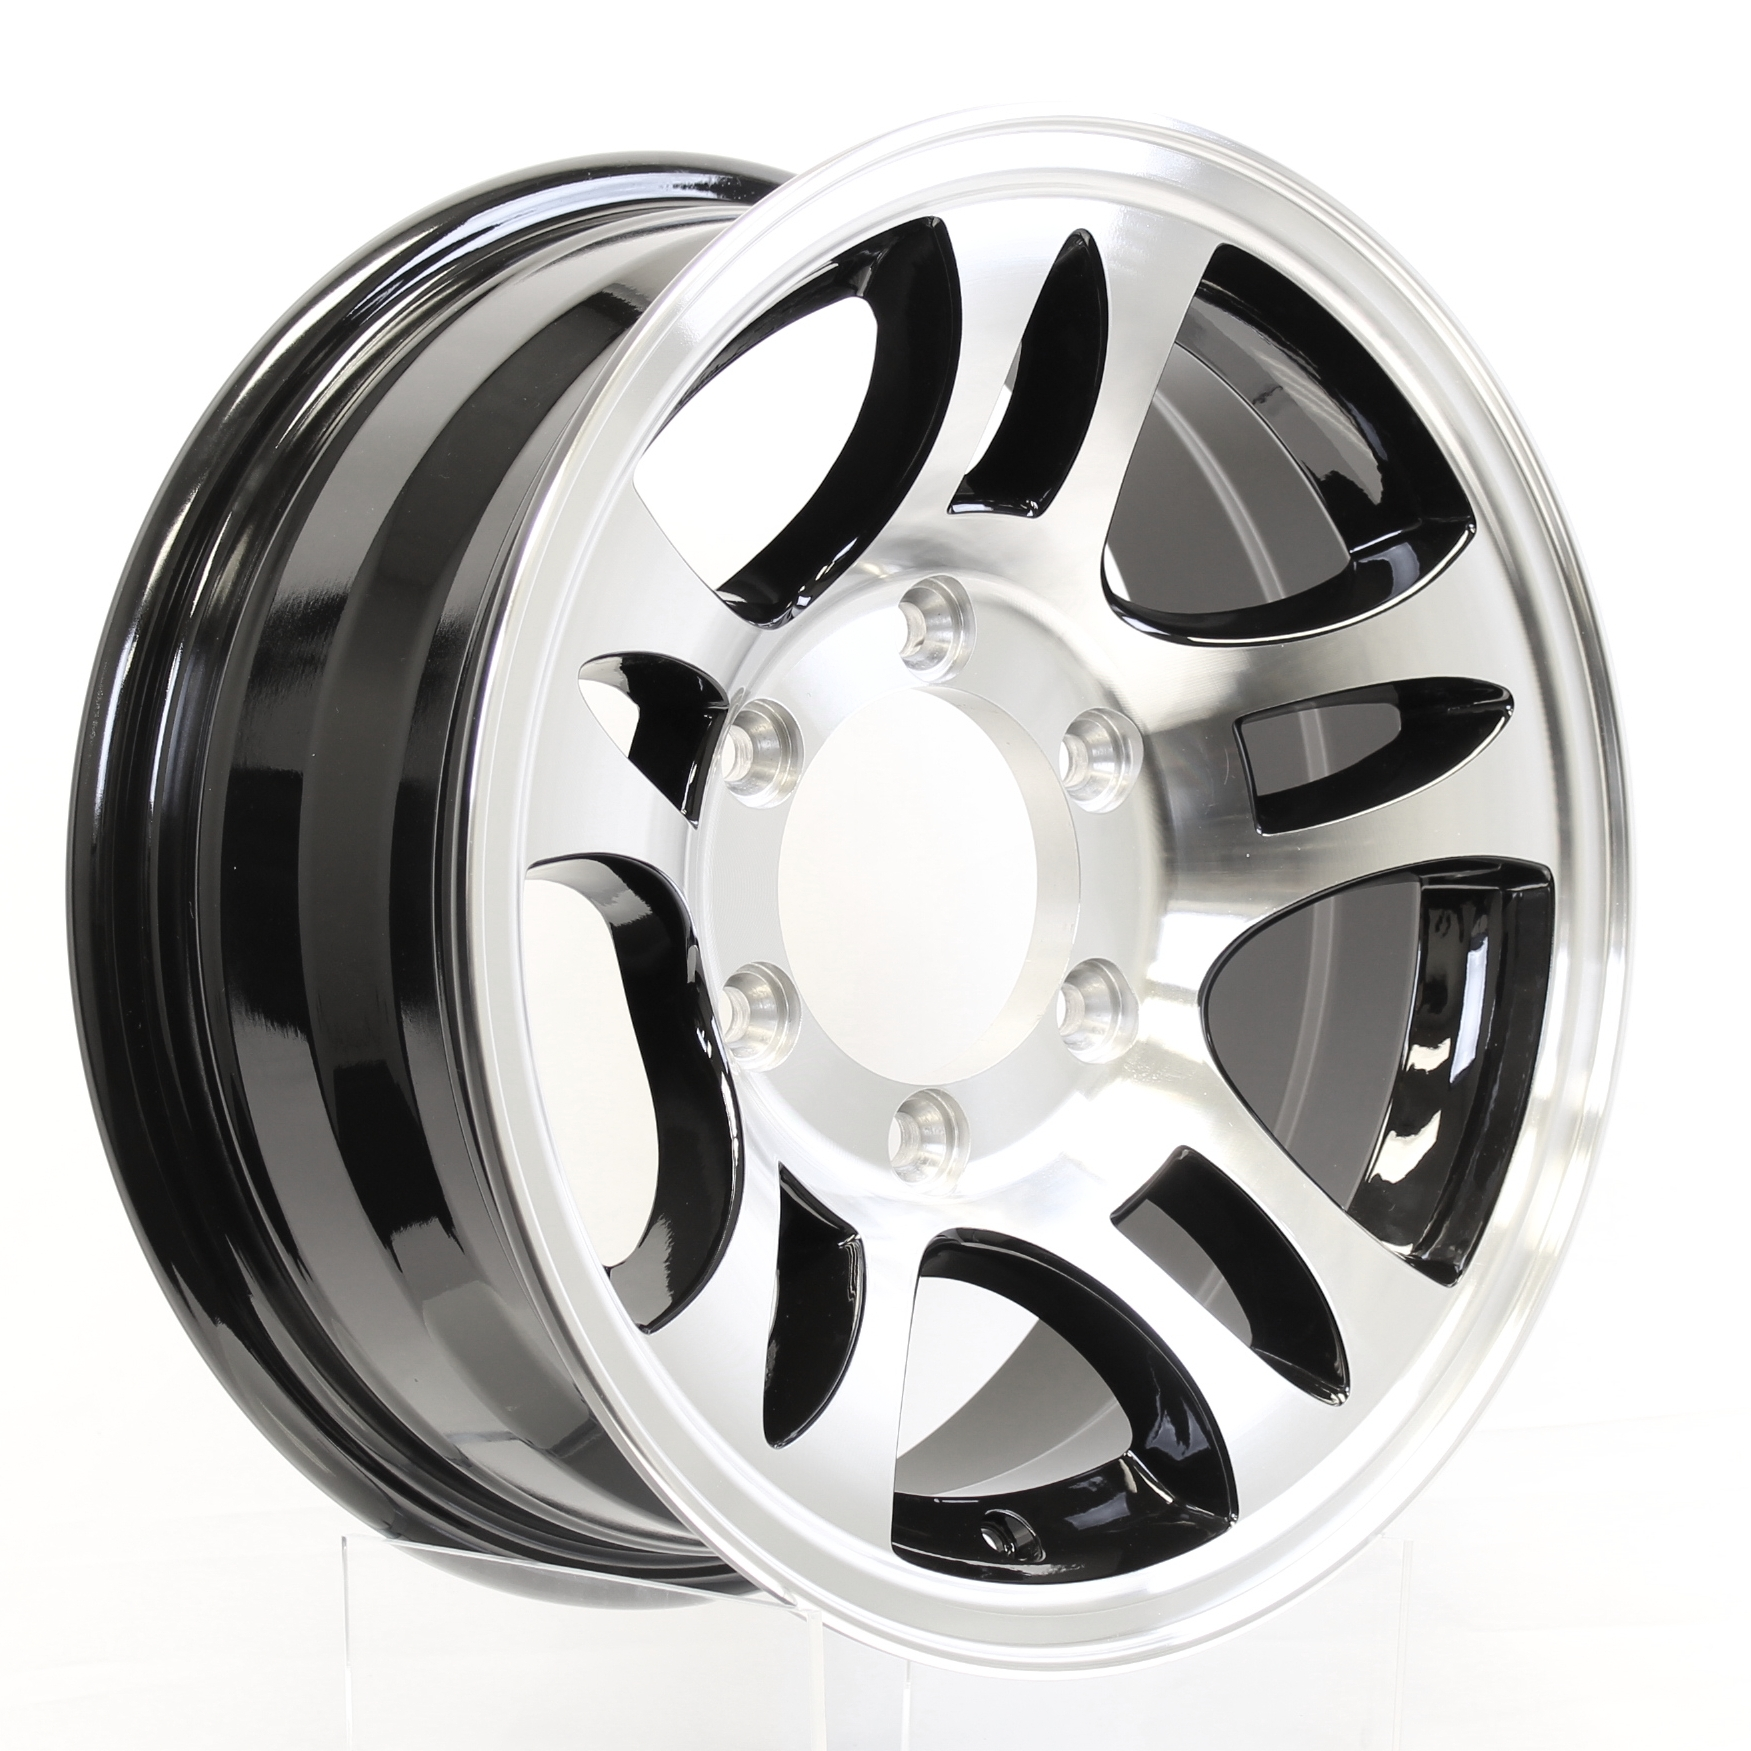 "T03 15"" 6-Lug Black Aluminum Trailer Wheel Image"